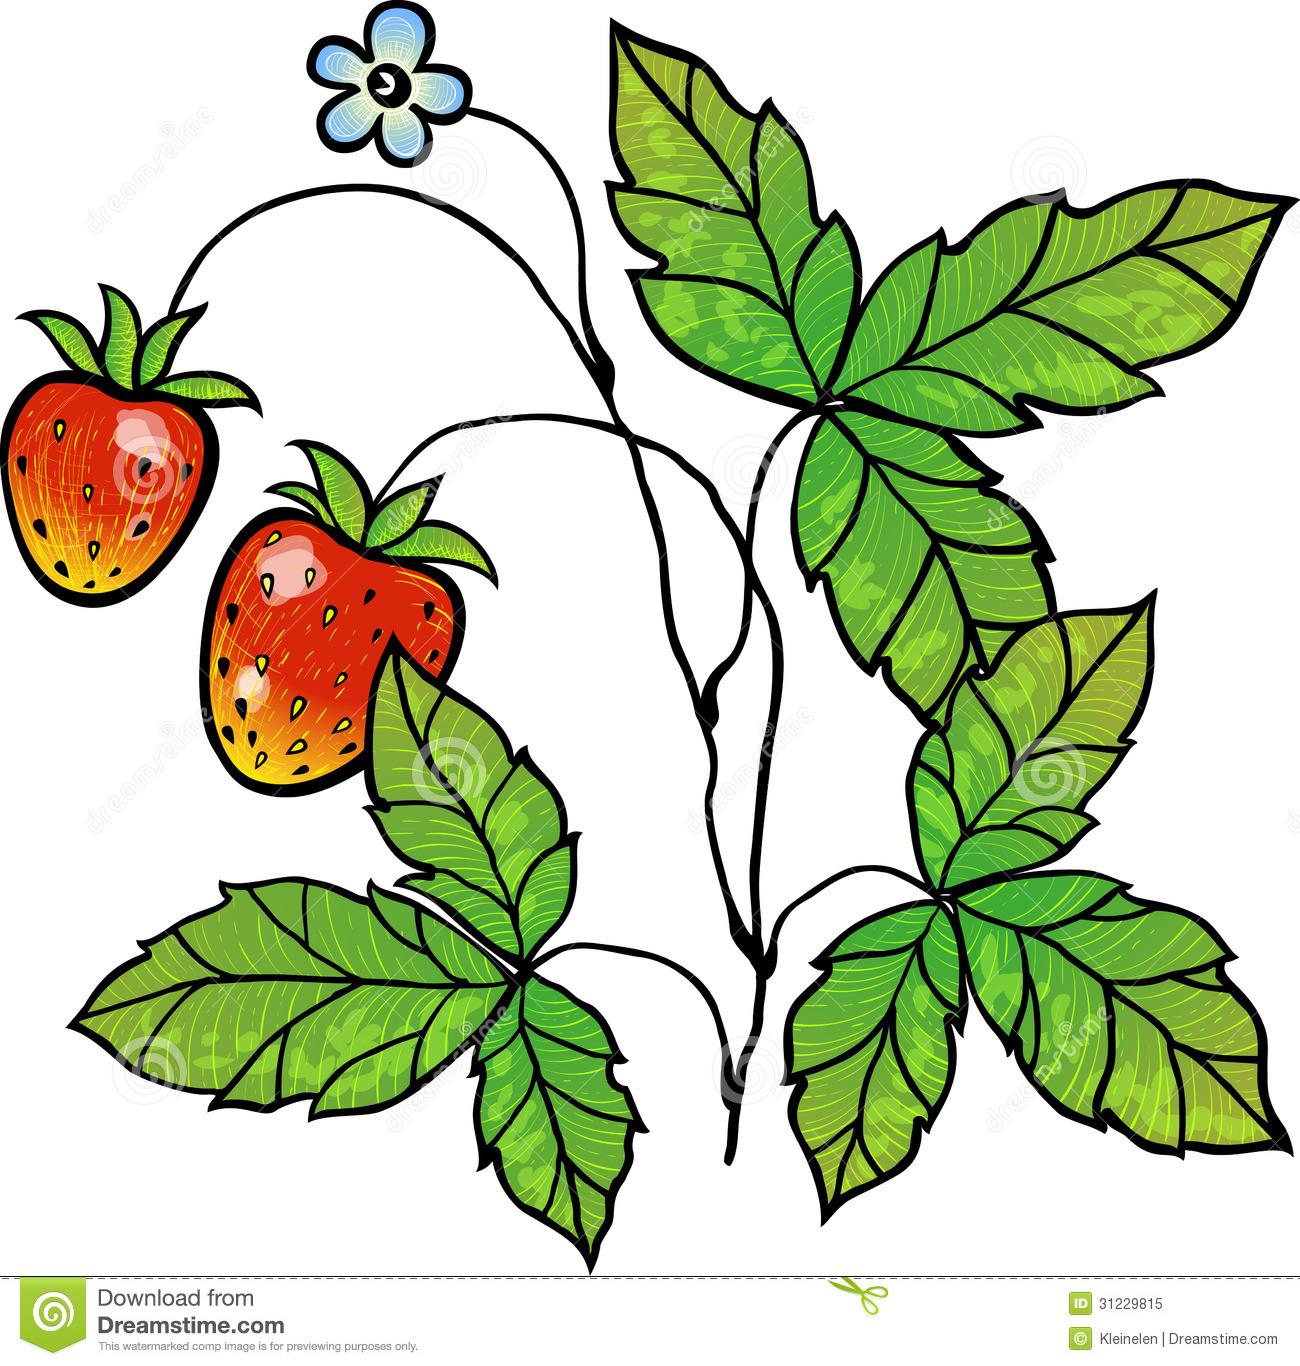 Strawberry icon free icons. Strawberries clipart bush